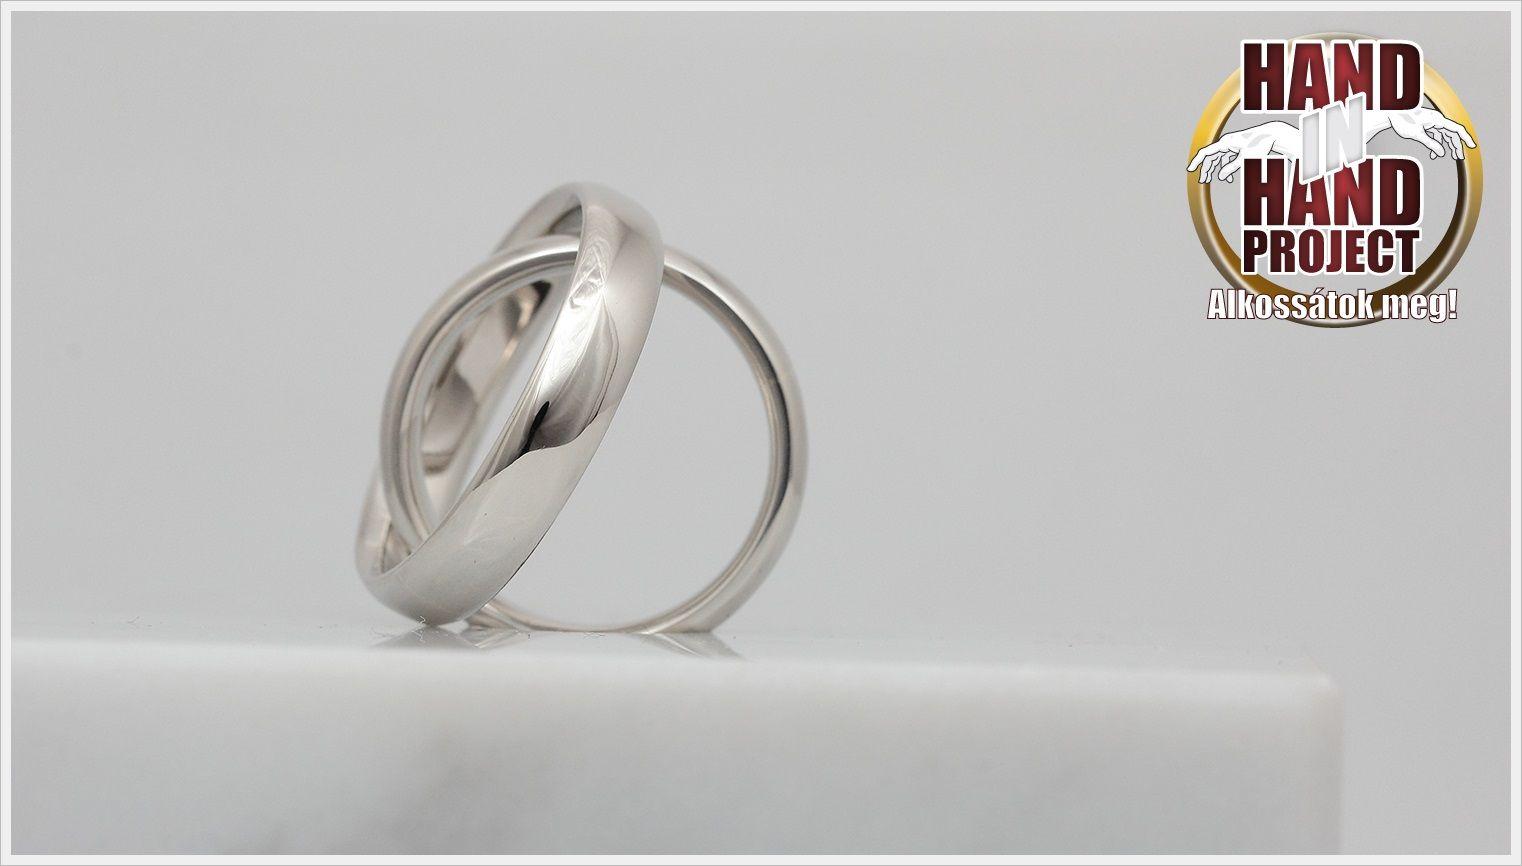 White gold wedding rings. (14-carat) Fehérarany. (Hand in Hand)